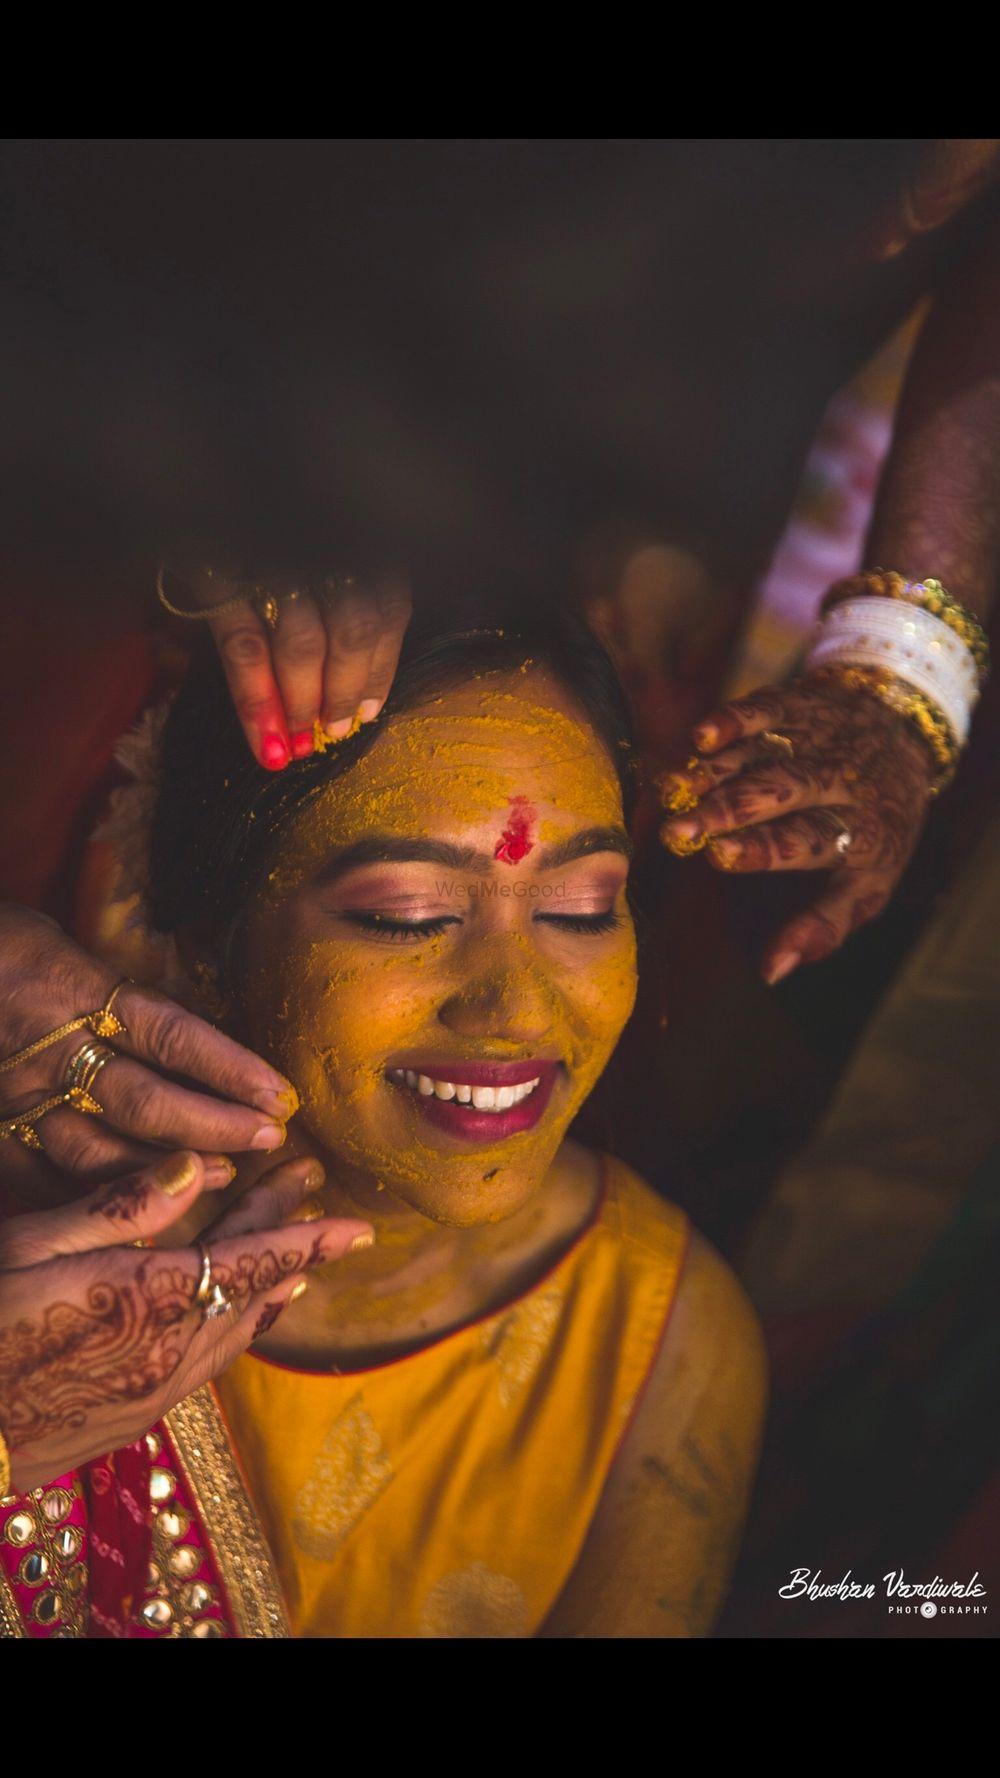 Photo From Collections: Haldi / Mehendi  - By Bhushan Vardiwale